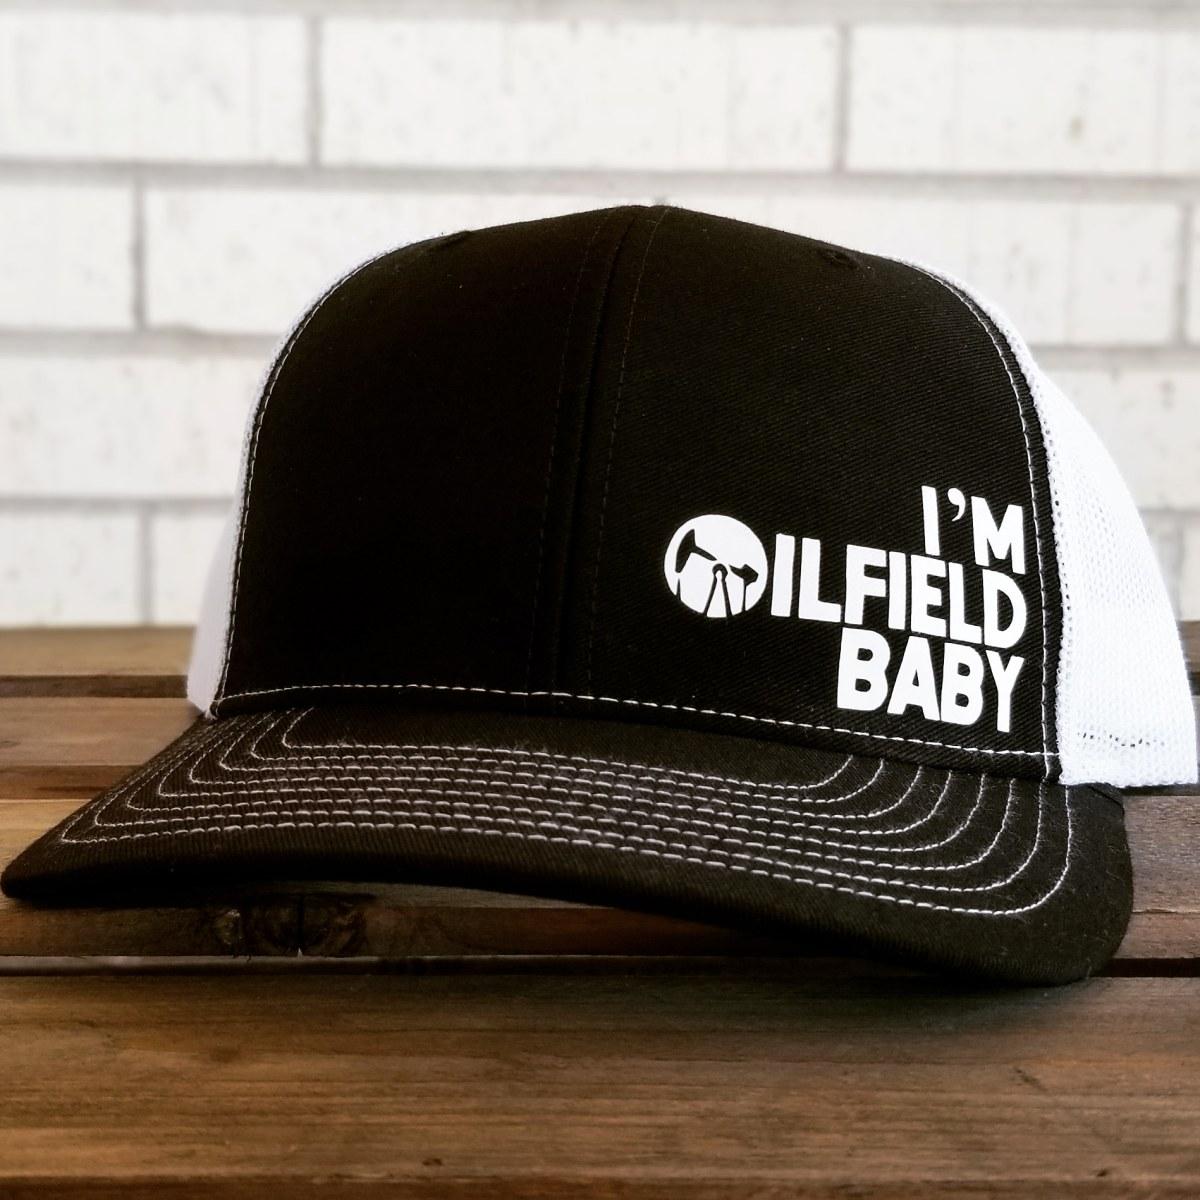 """I'm Oilfield Baby"" | Oilfield Caps"